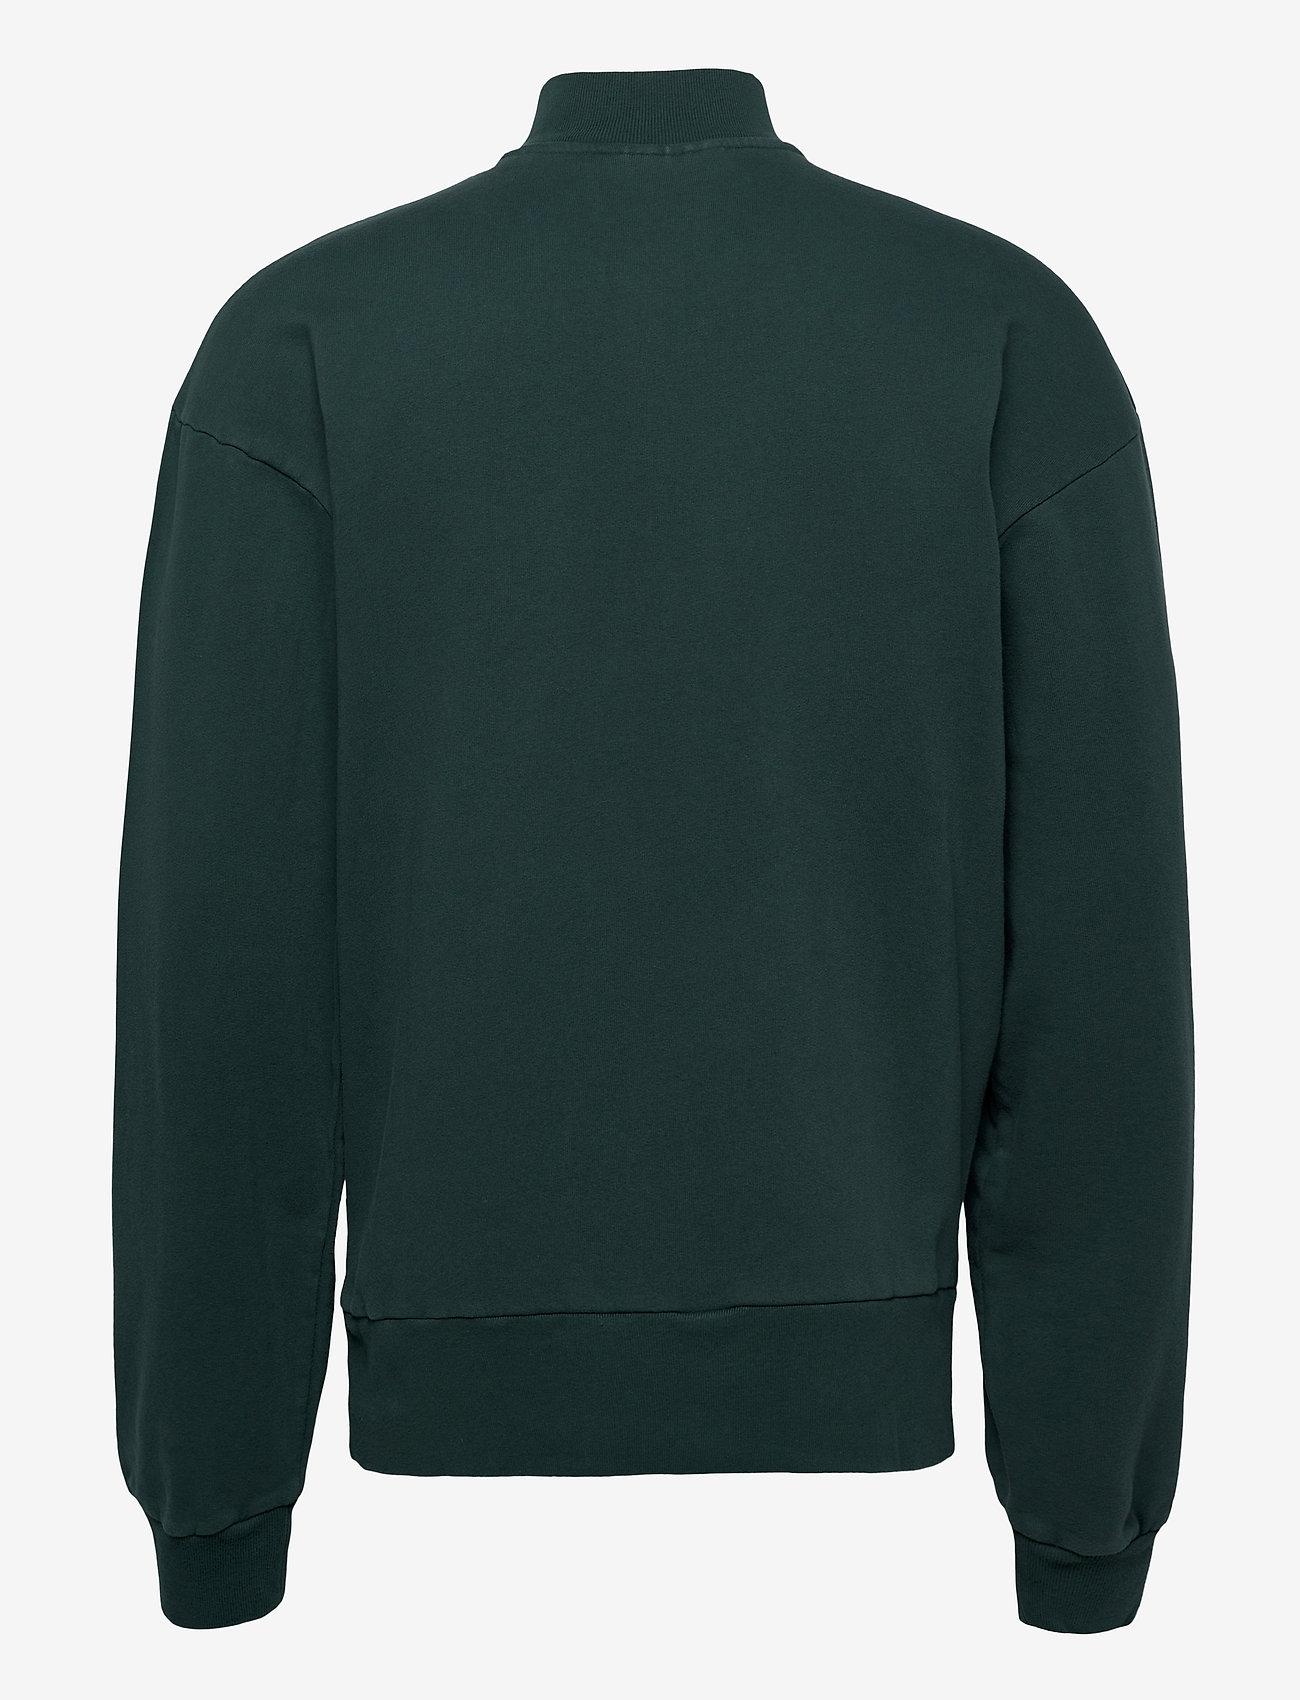 HAN Kjøbenhavn Half Zip Sweat - Sweatshirts FADED GREEN - Menn Klær